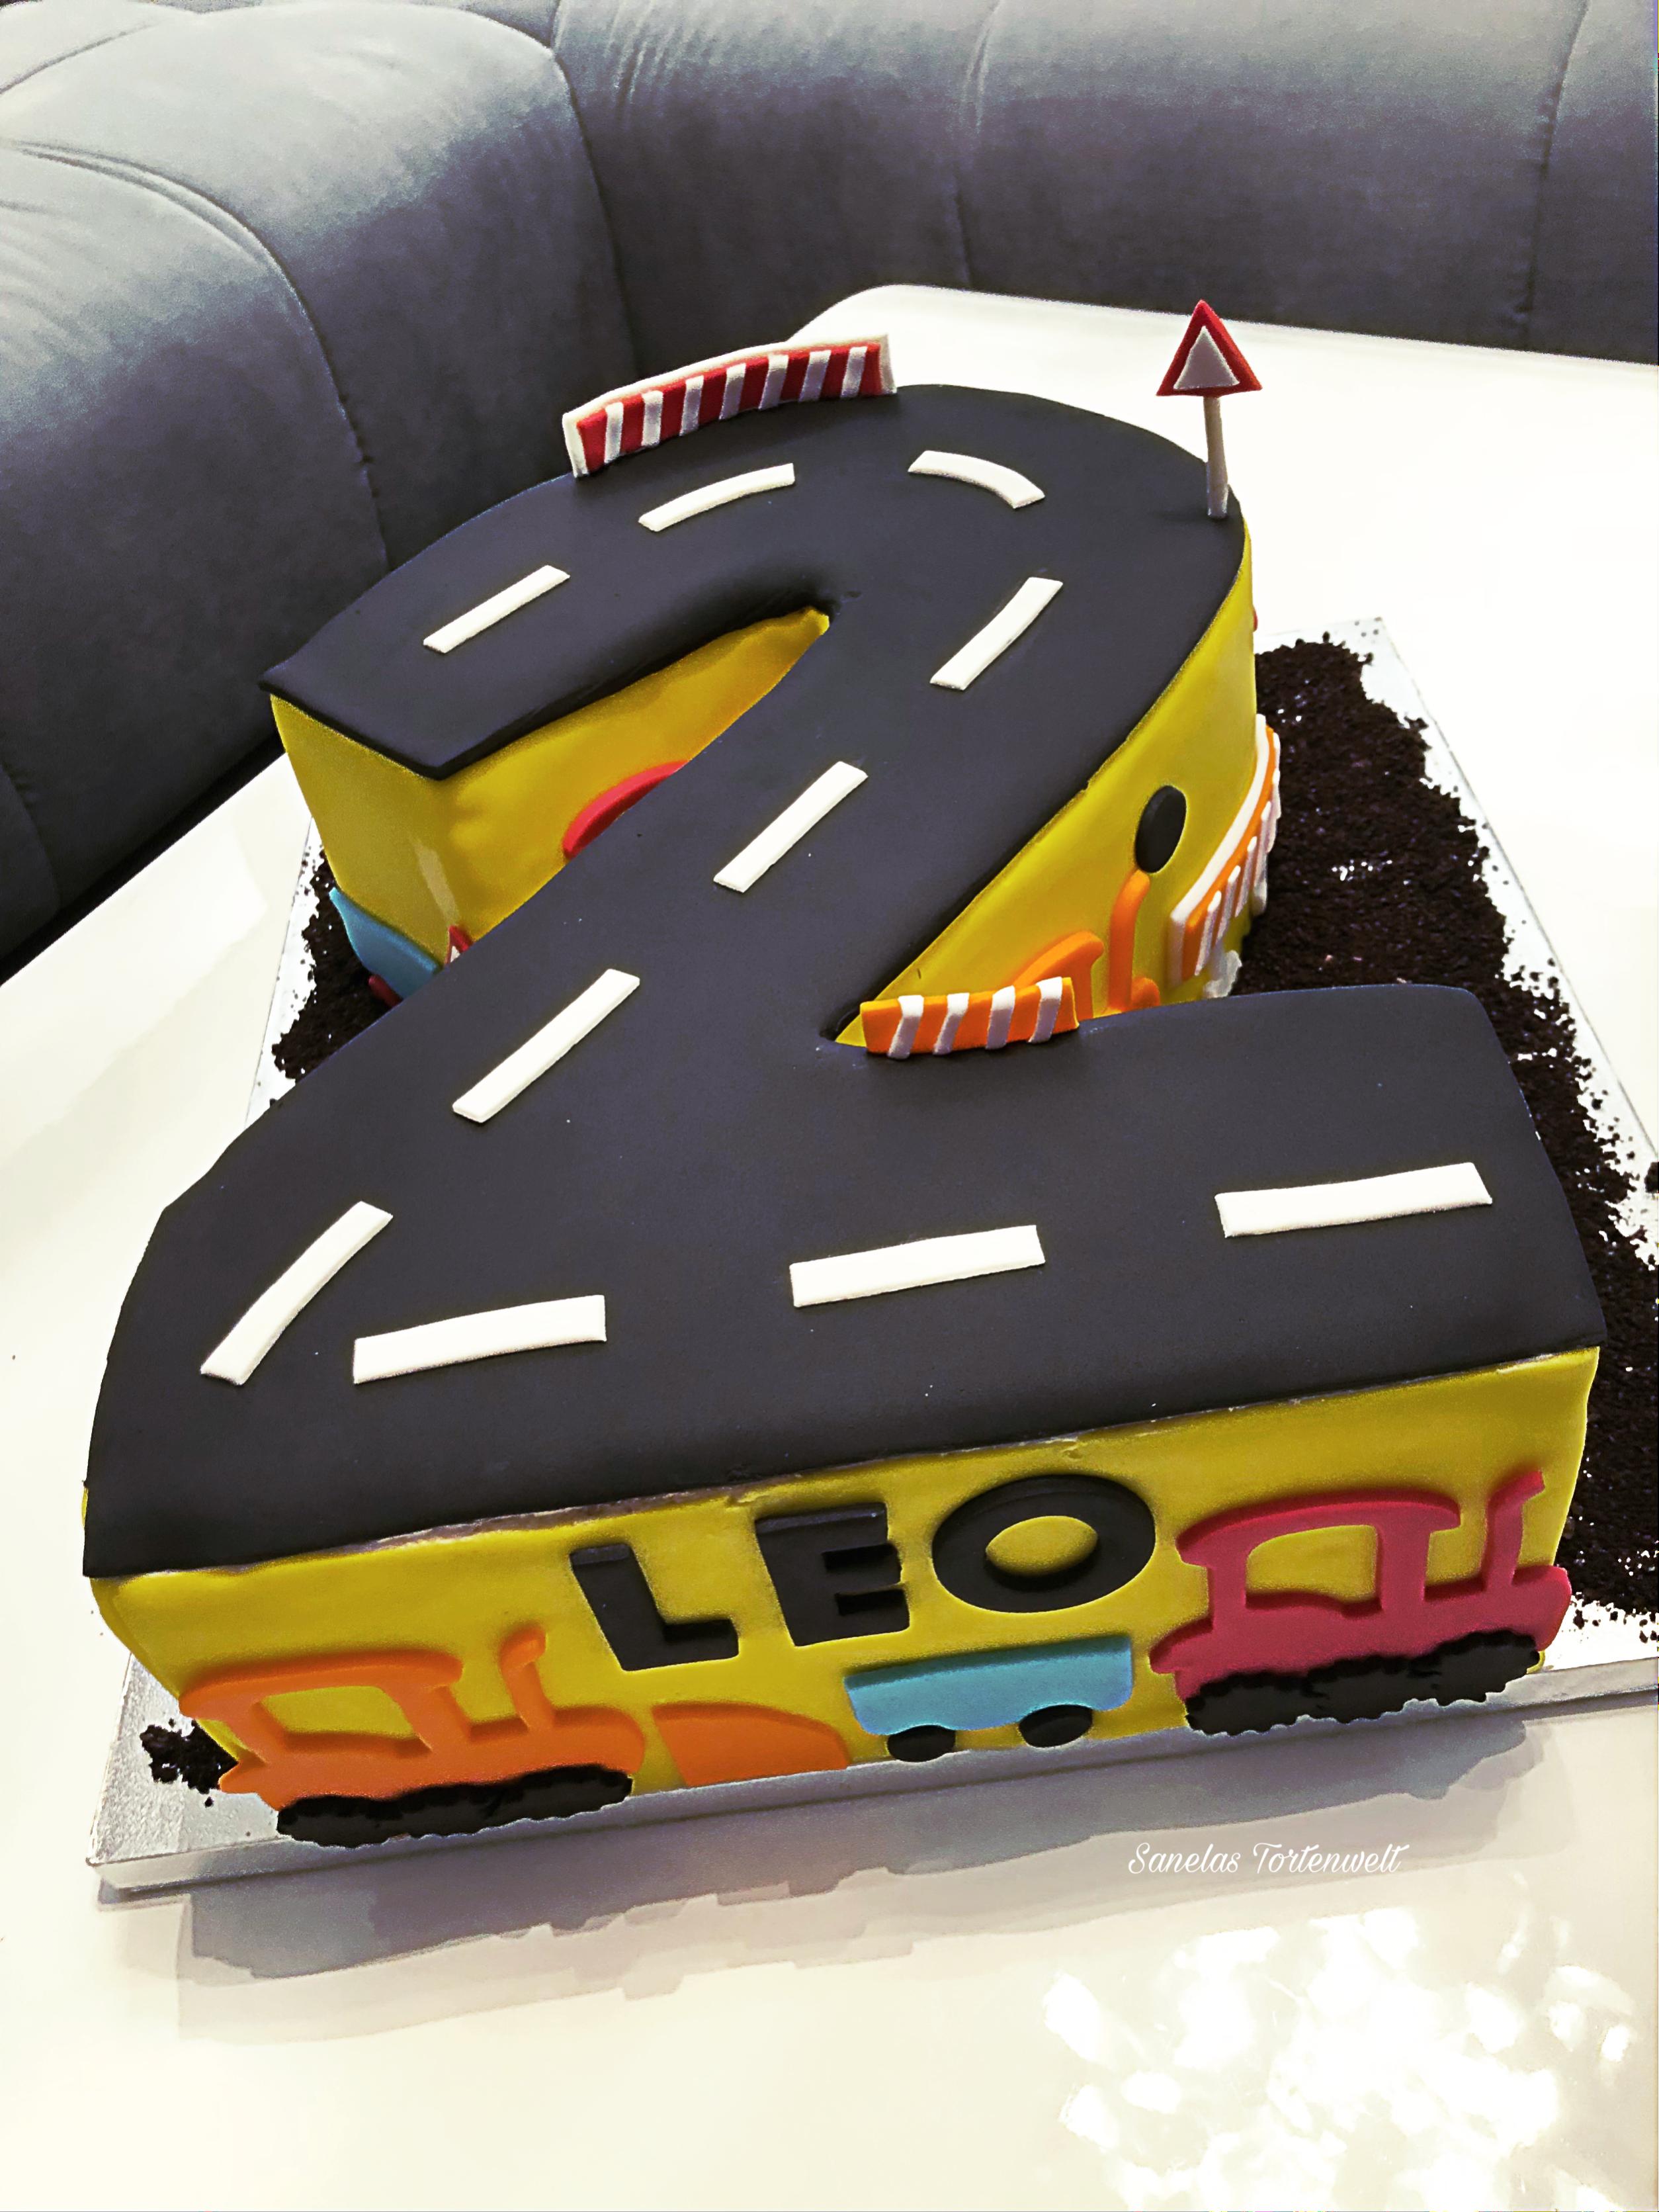 Torte Zum 2 Geburtstag Torte Fur Jungs Bagger Traktor Bagger Geburtstag Torten Fur Jungs Geburtstag Torte